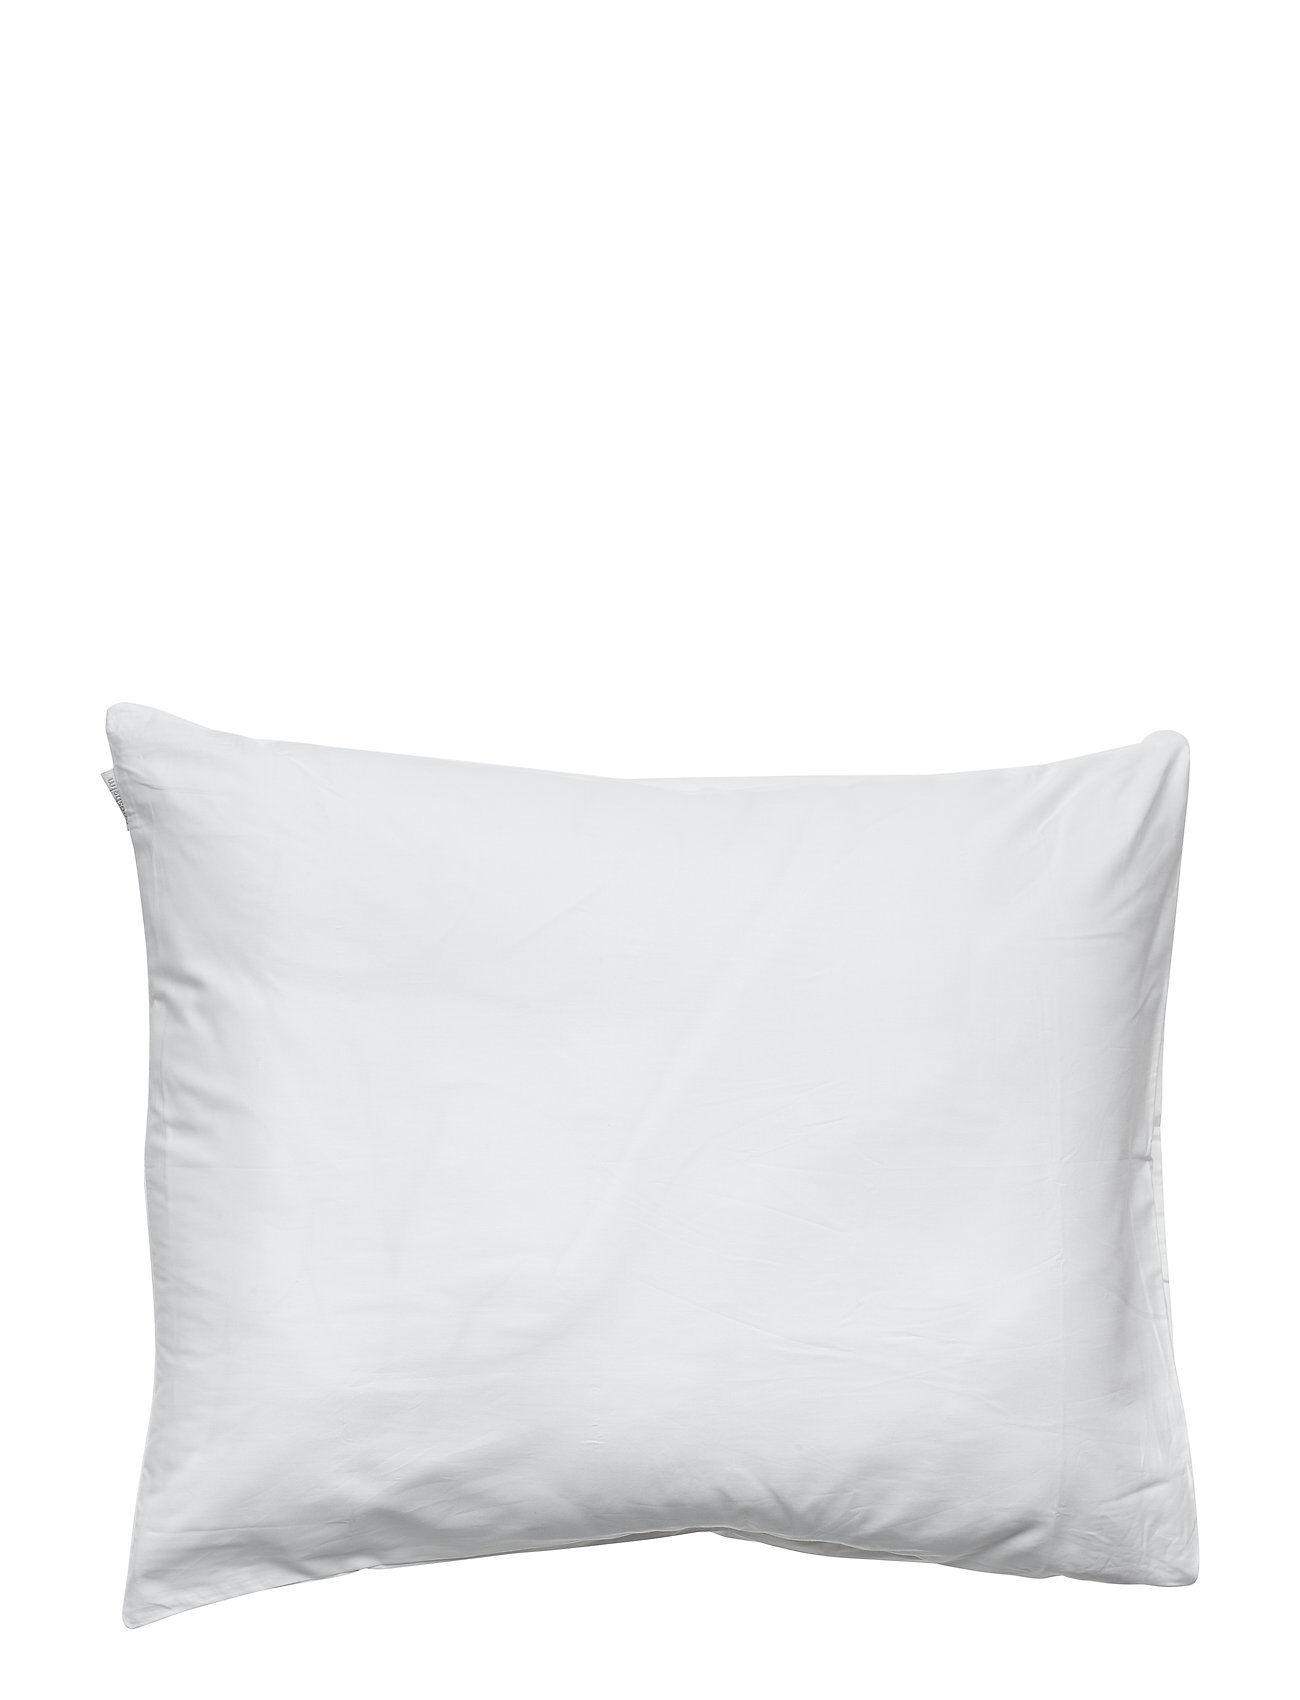 Gripsholm Pillowcase Eco Percale Home Bedroom Bedding Pillowcases Valkoinen Gripsholm